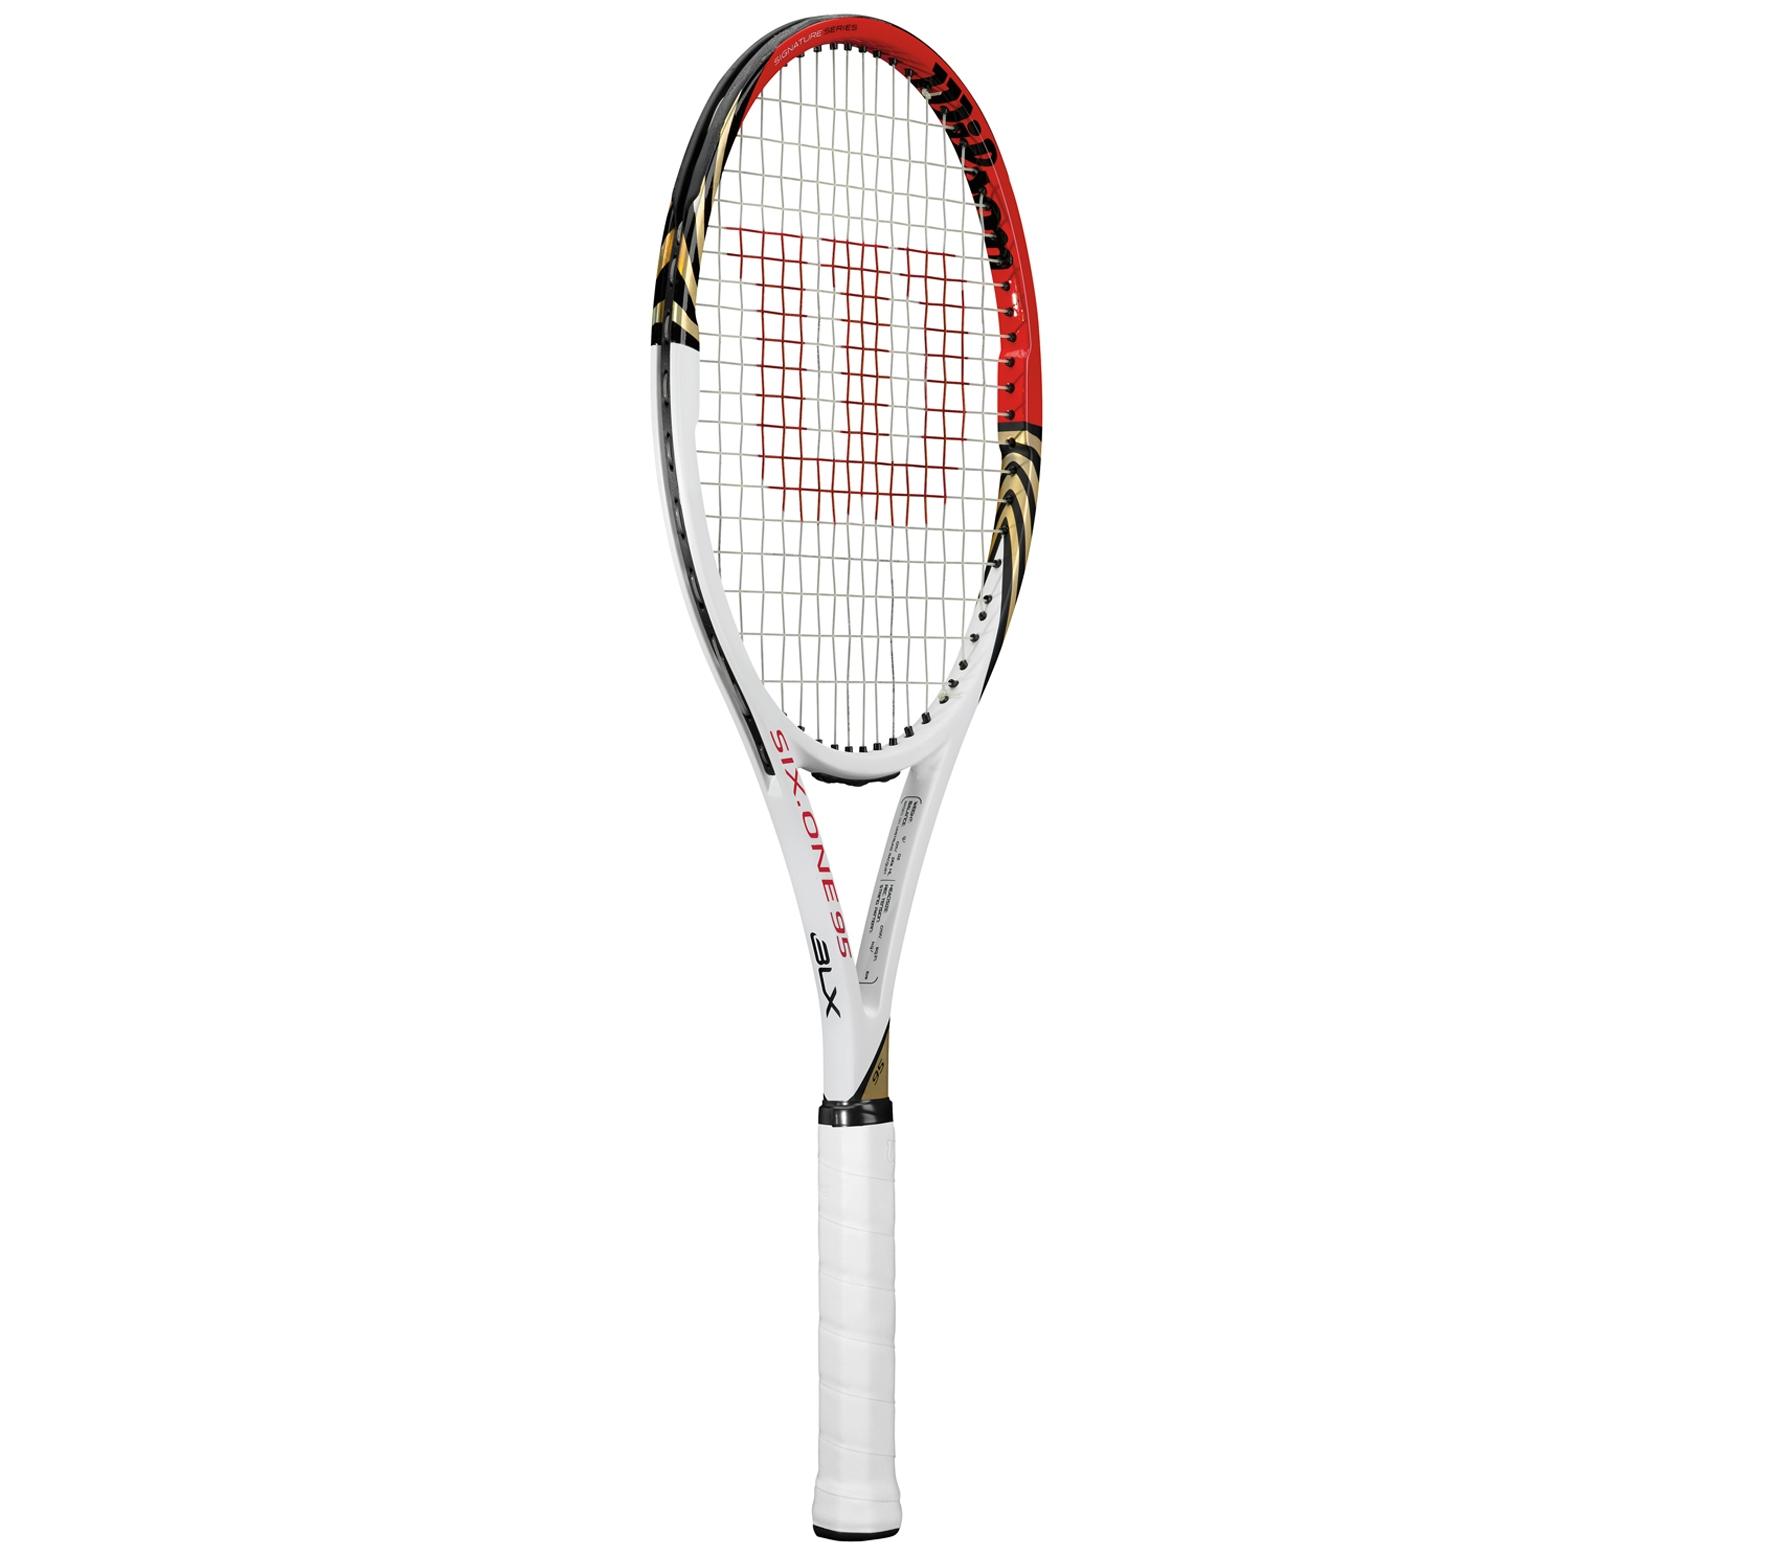 wilson craquette de tennis pro staff six one 95 blx l4. Black Bedroom Furniture Sets. Home Design Ideas